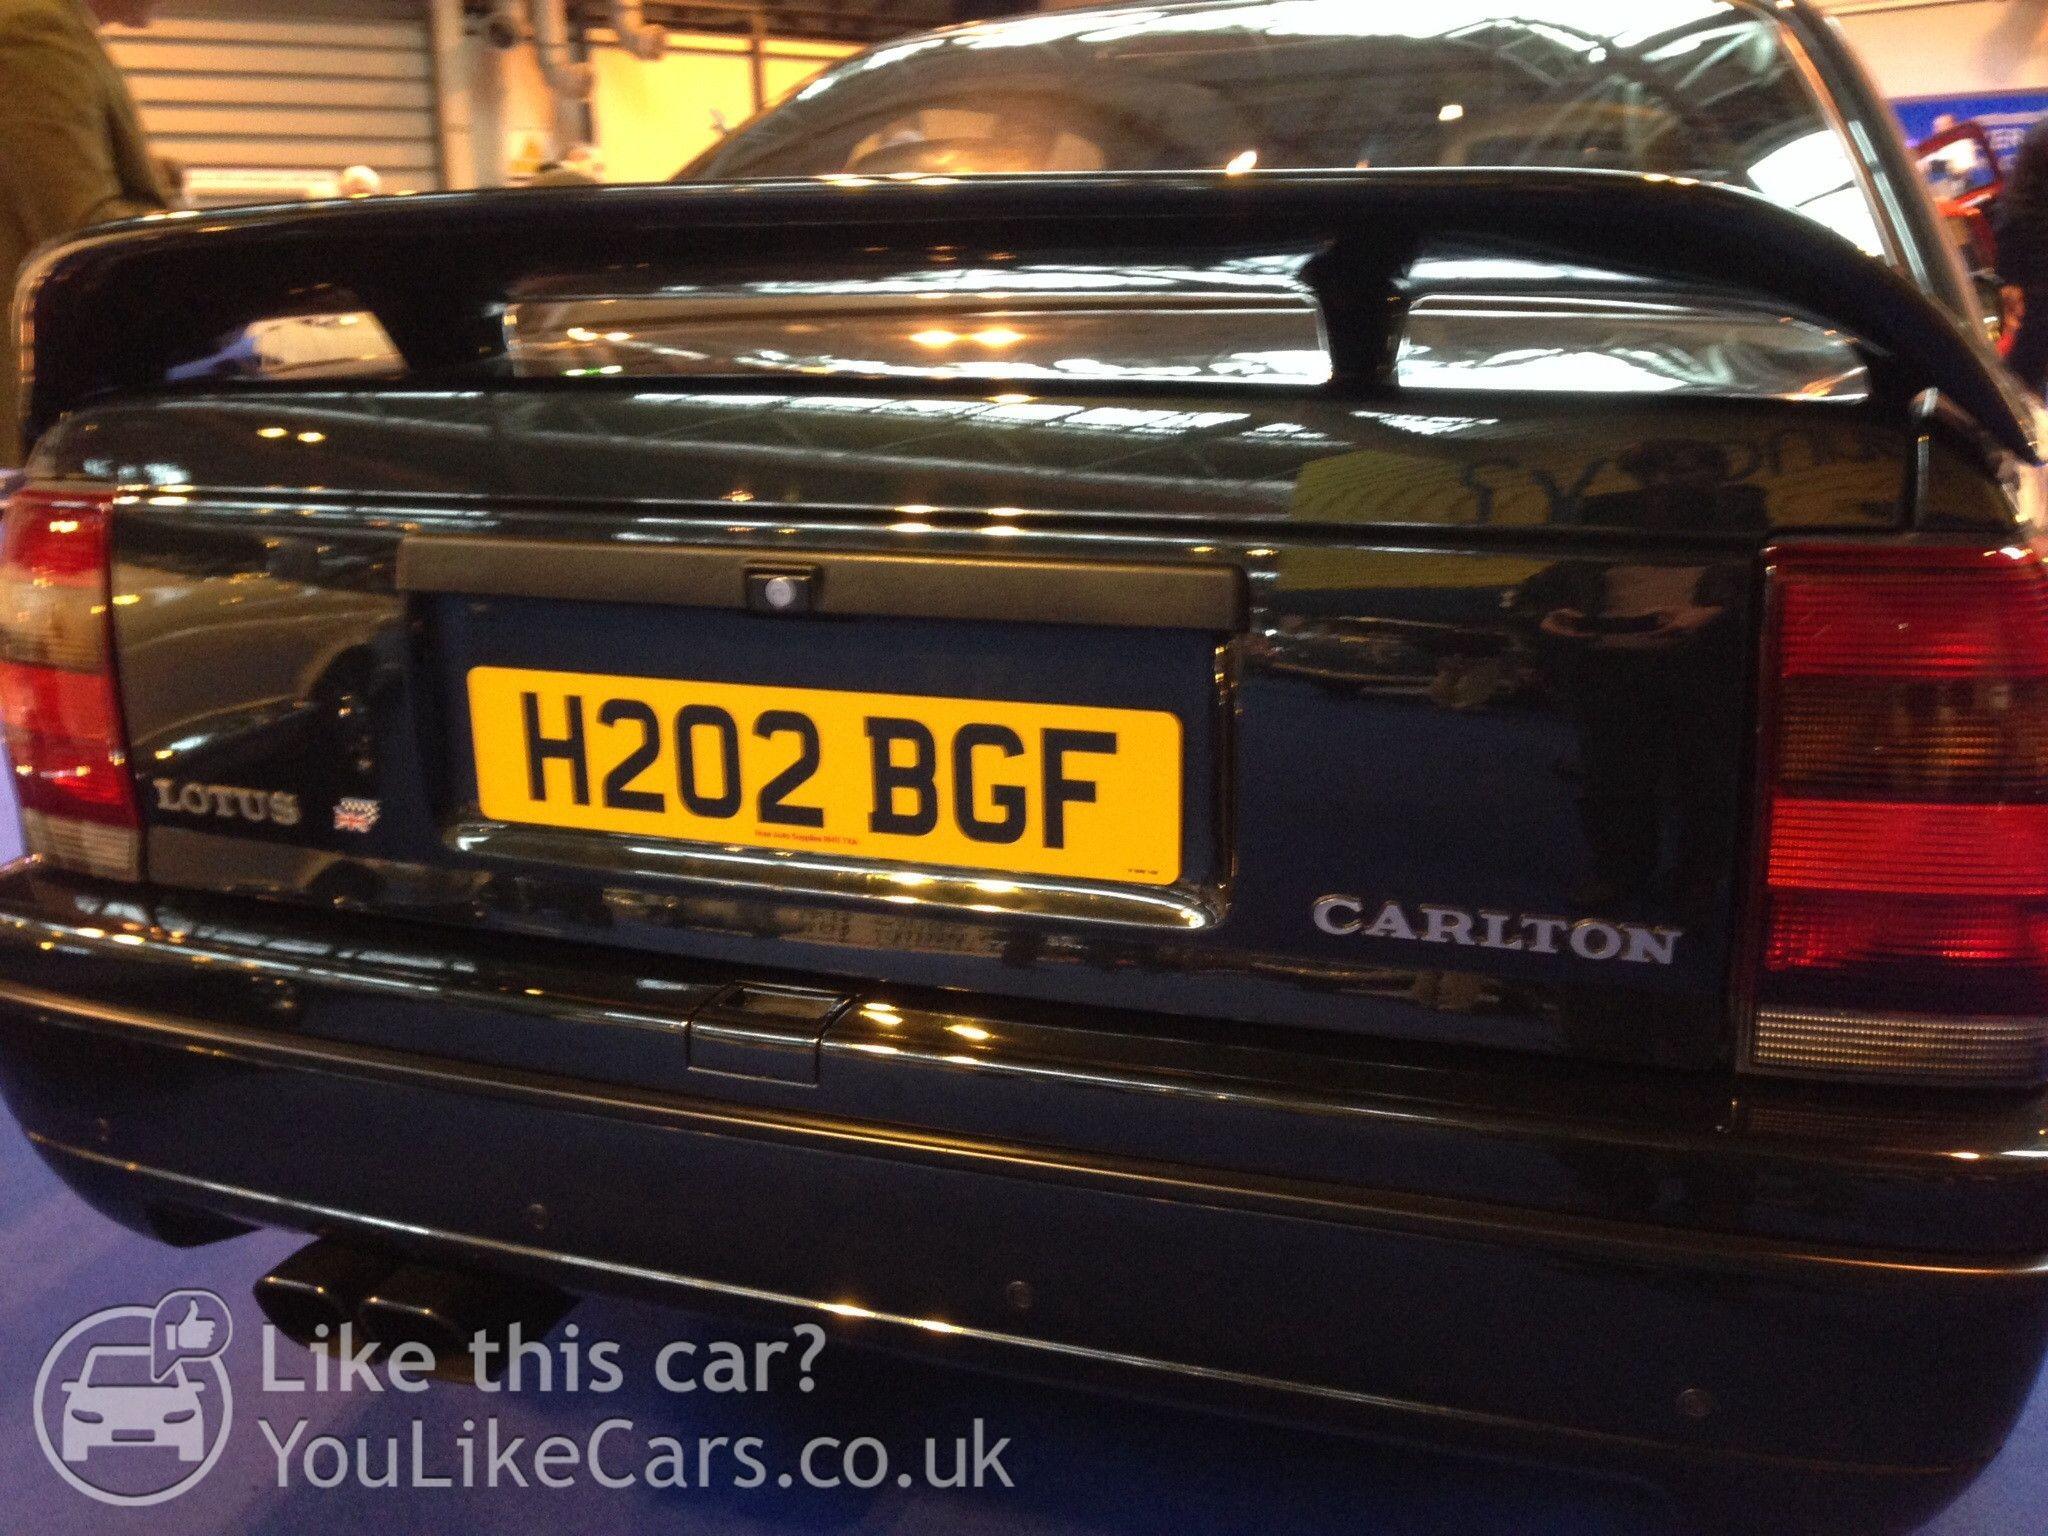 e4229c6461dd5d2f8ea2bbd0a4d332c3 Astounding Vauxhall Lotus Carlton 3.6 Twin Turbo for Sale Cars Trend